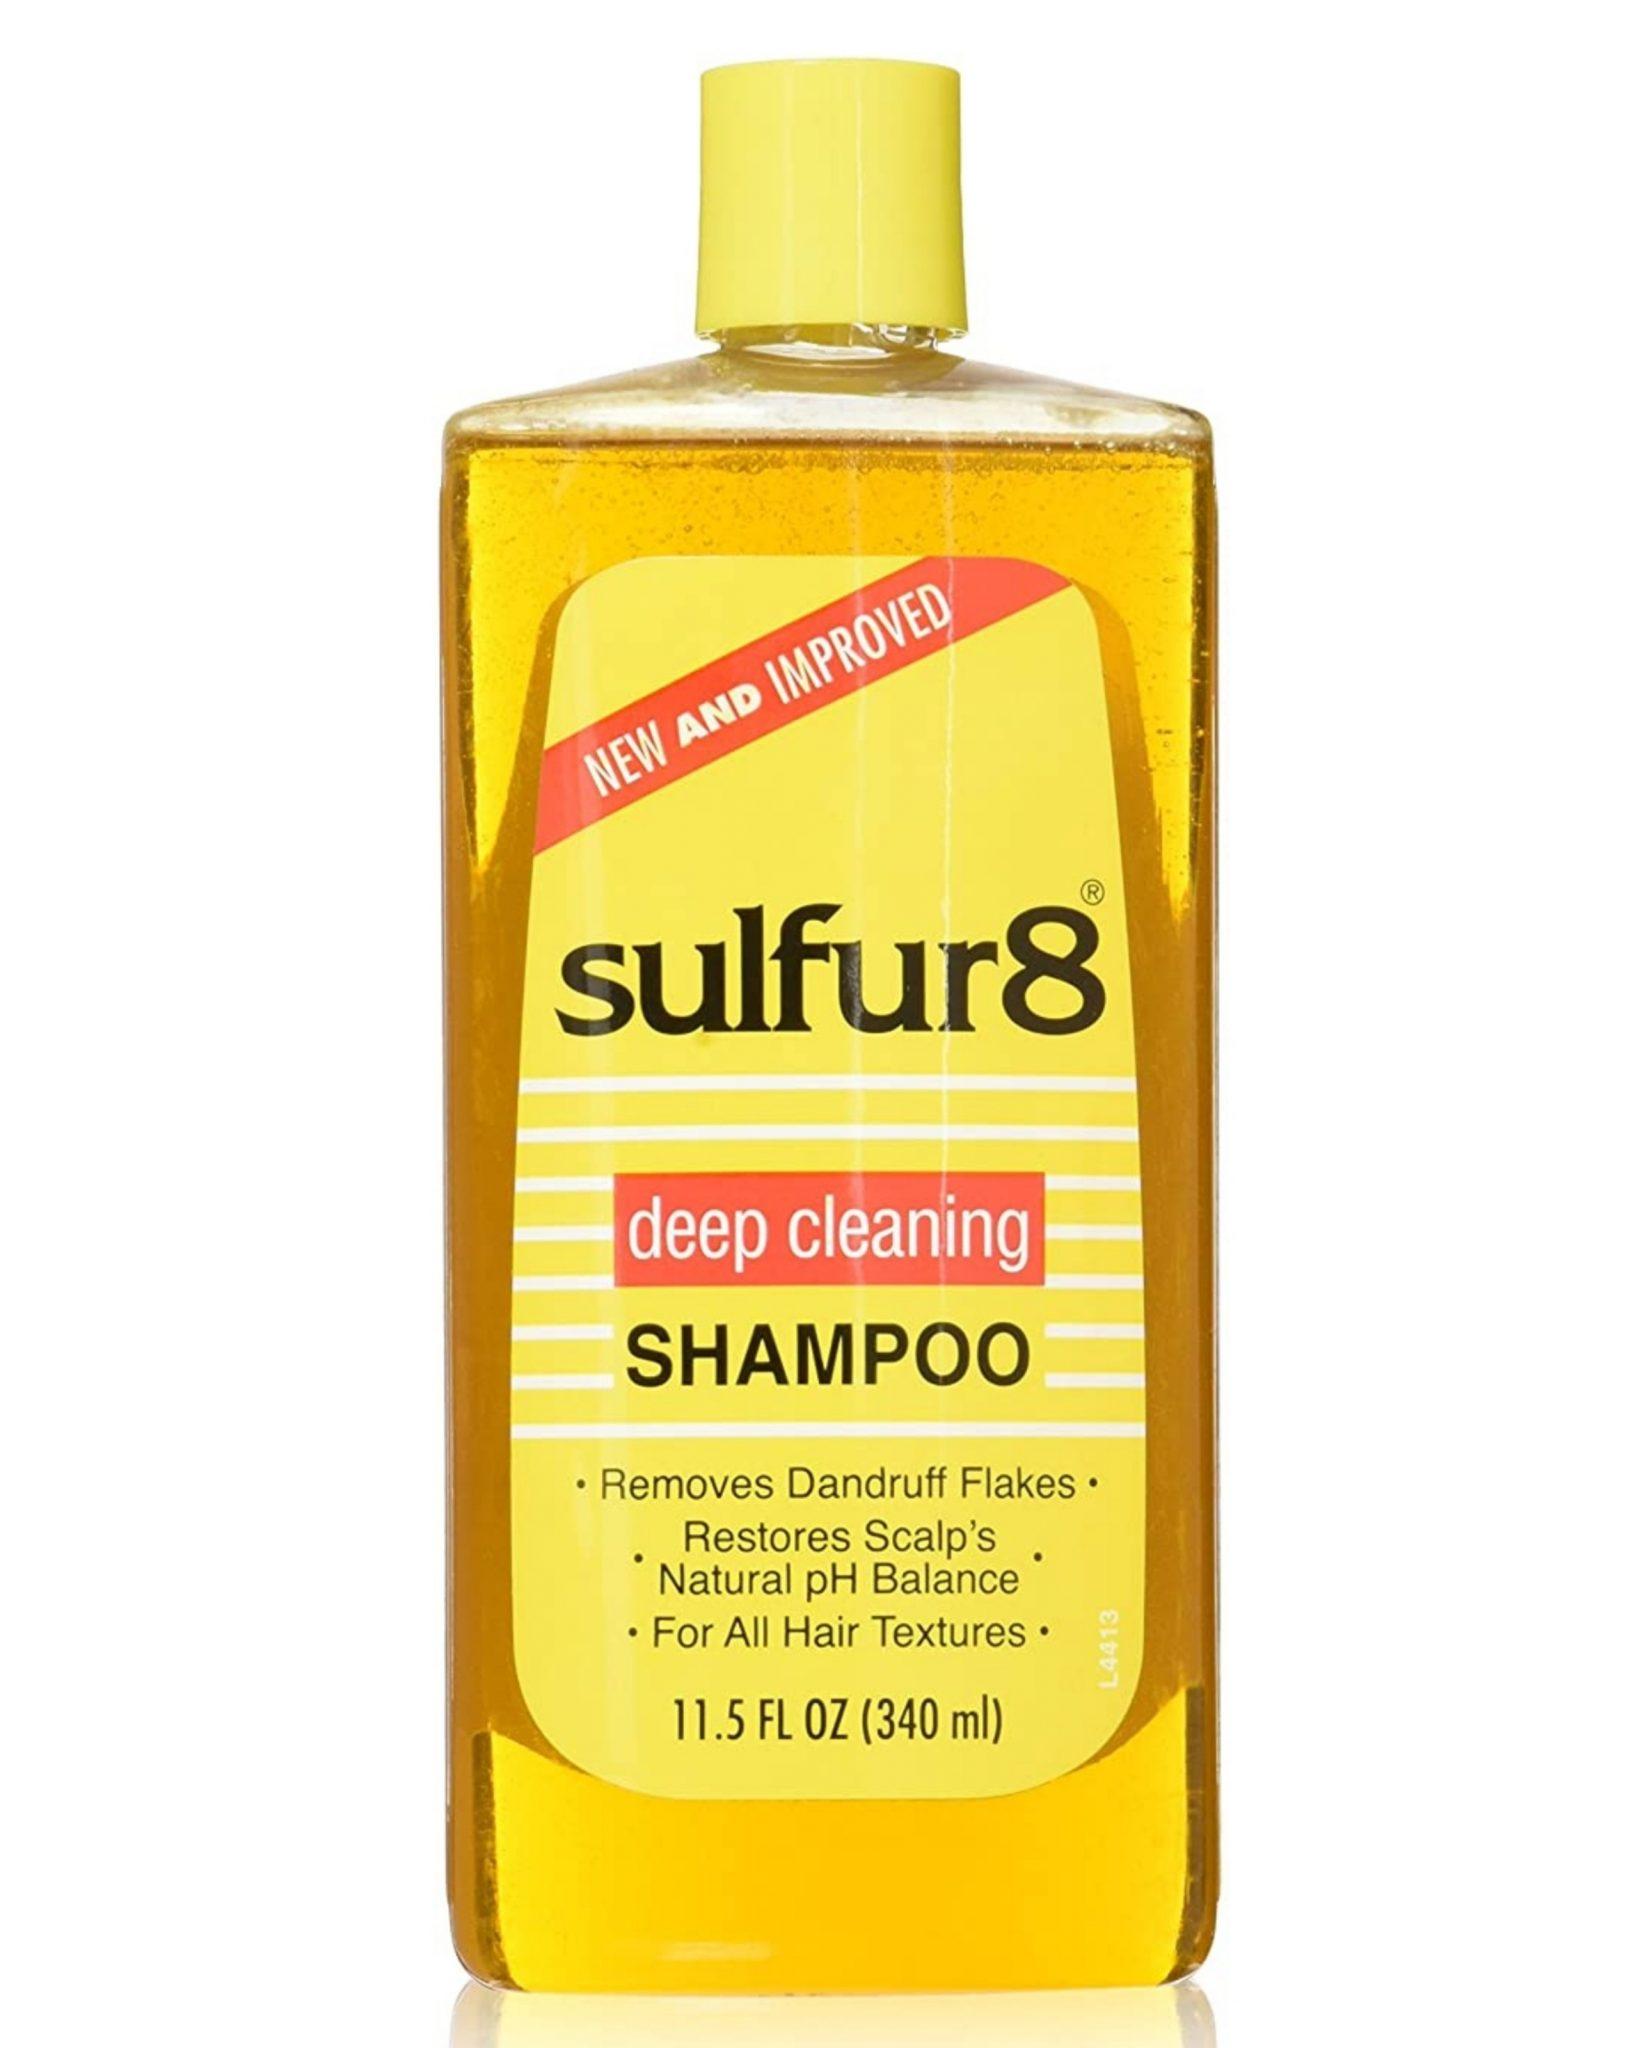 Sulfur8 Deep Cleaning Shampoo 11.5Oz